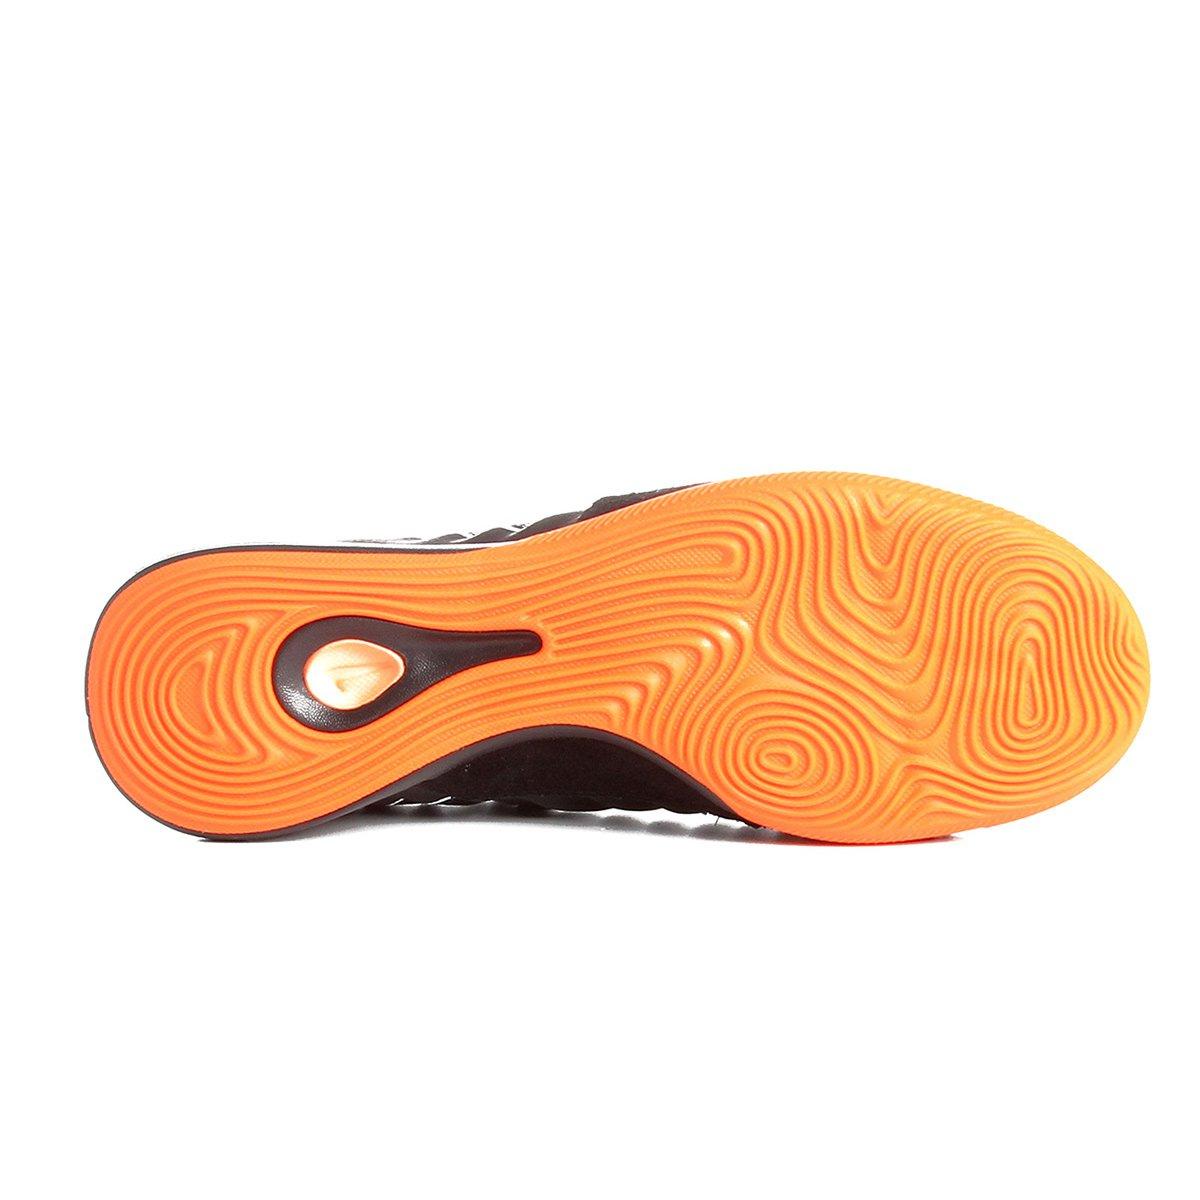 89c3070439 Chuteira Futsal Nike Tiempo Lunar Legend 7 Pro IC - Compre Agora ...